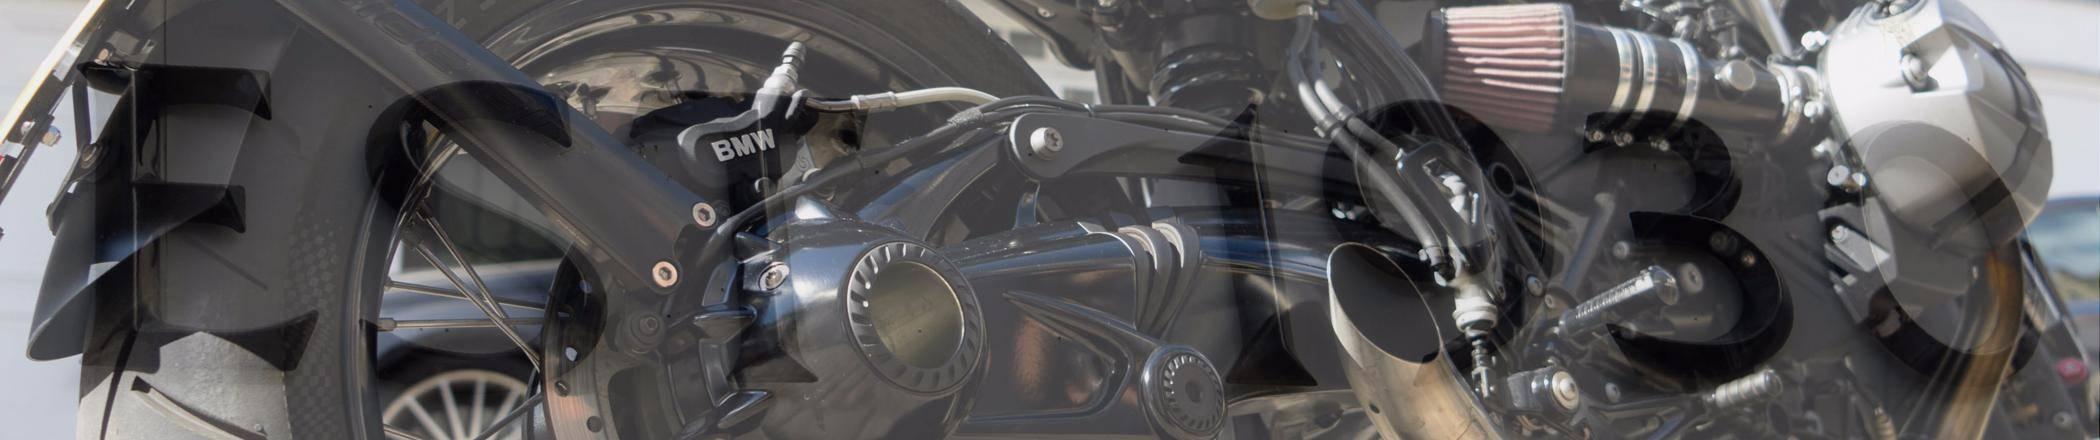 Motorbike repair services